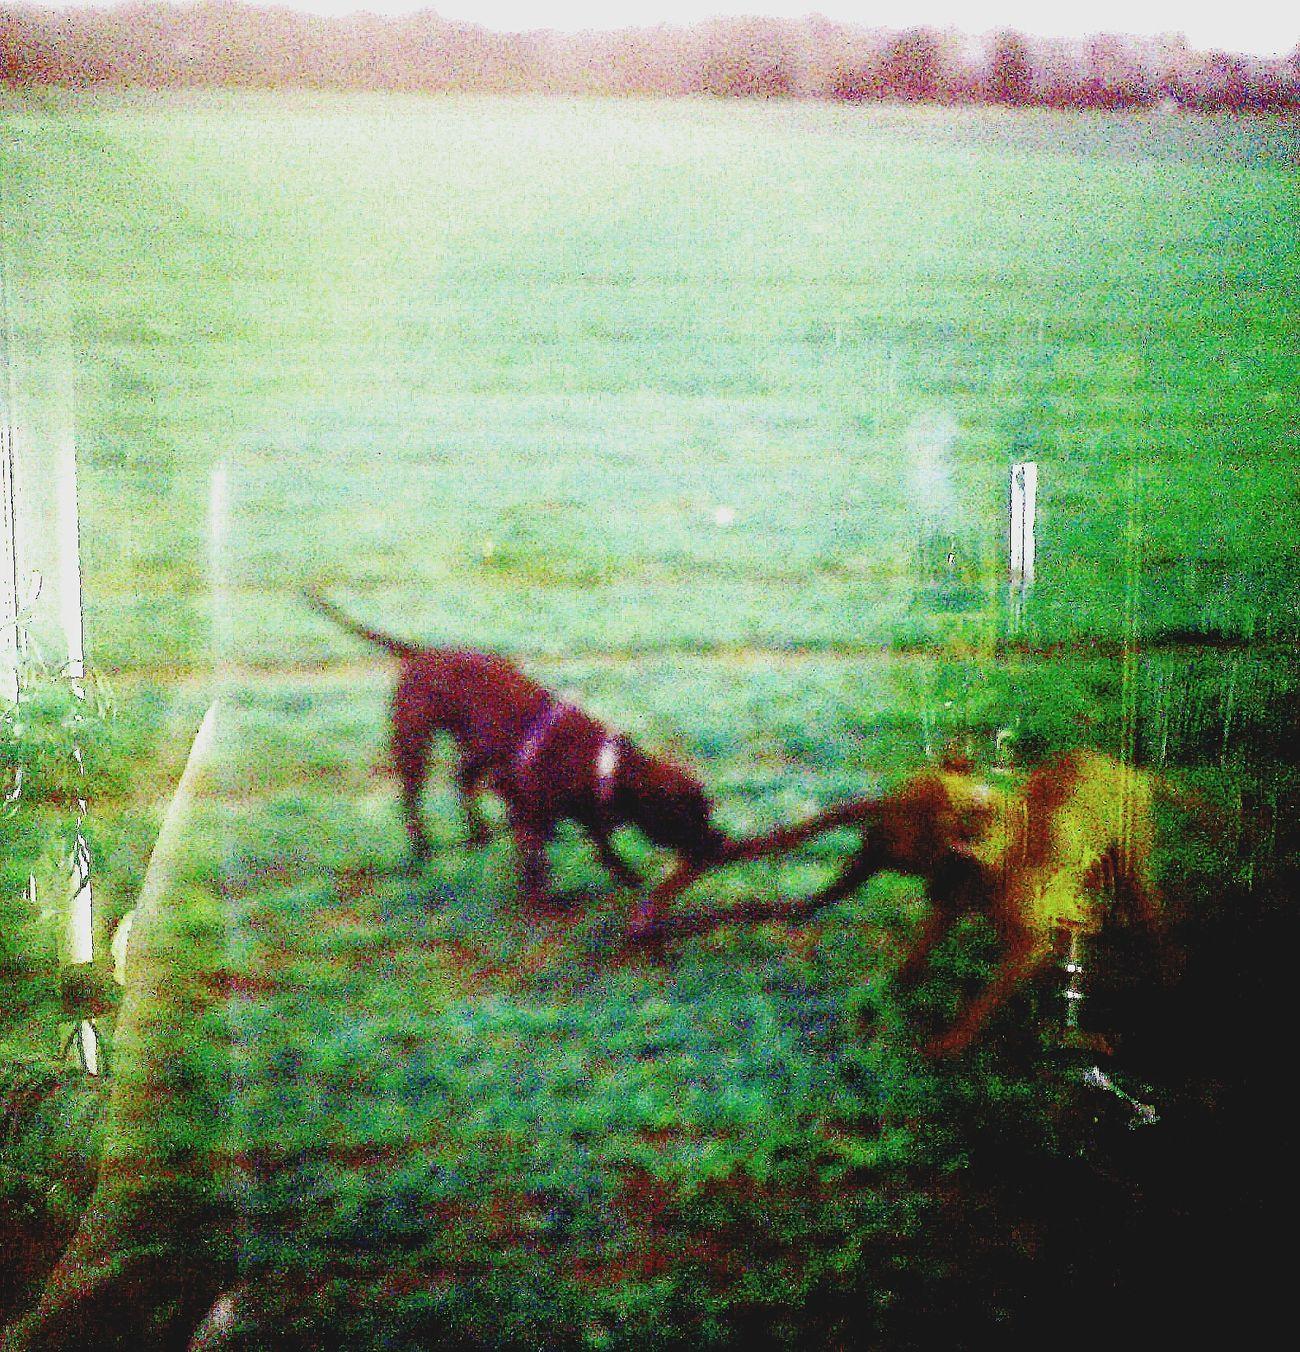 Dog play Doggy Love